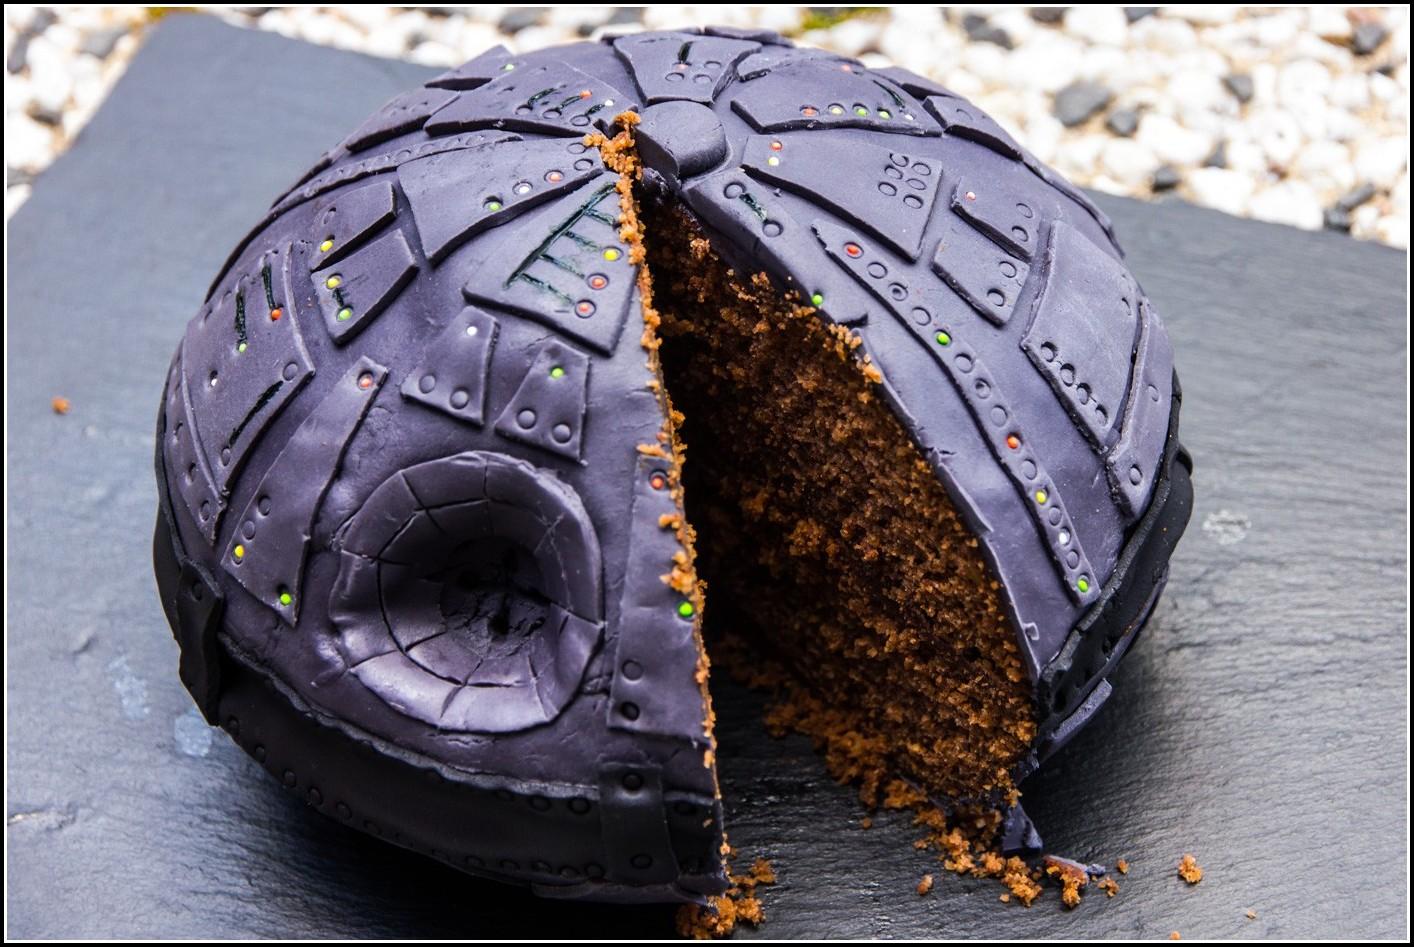 Darth Vader Kuchenform Rezept